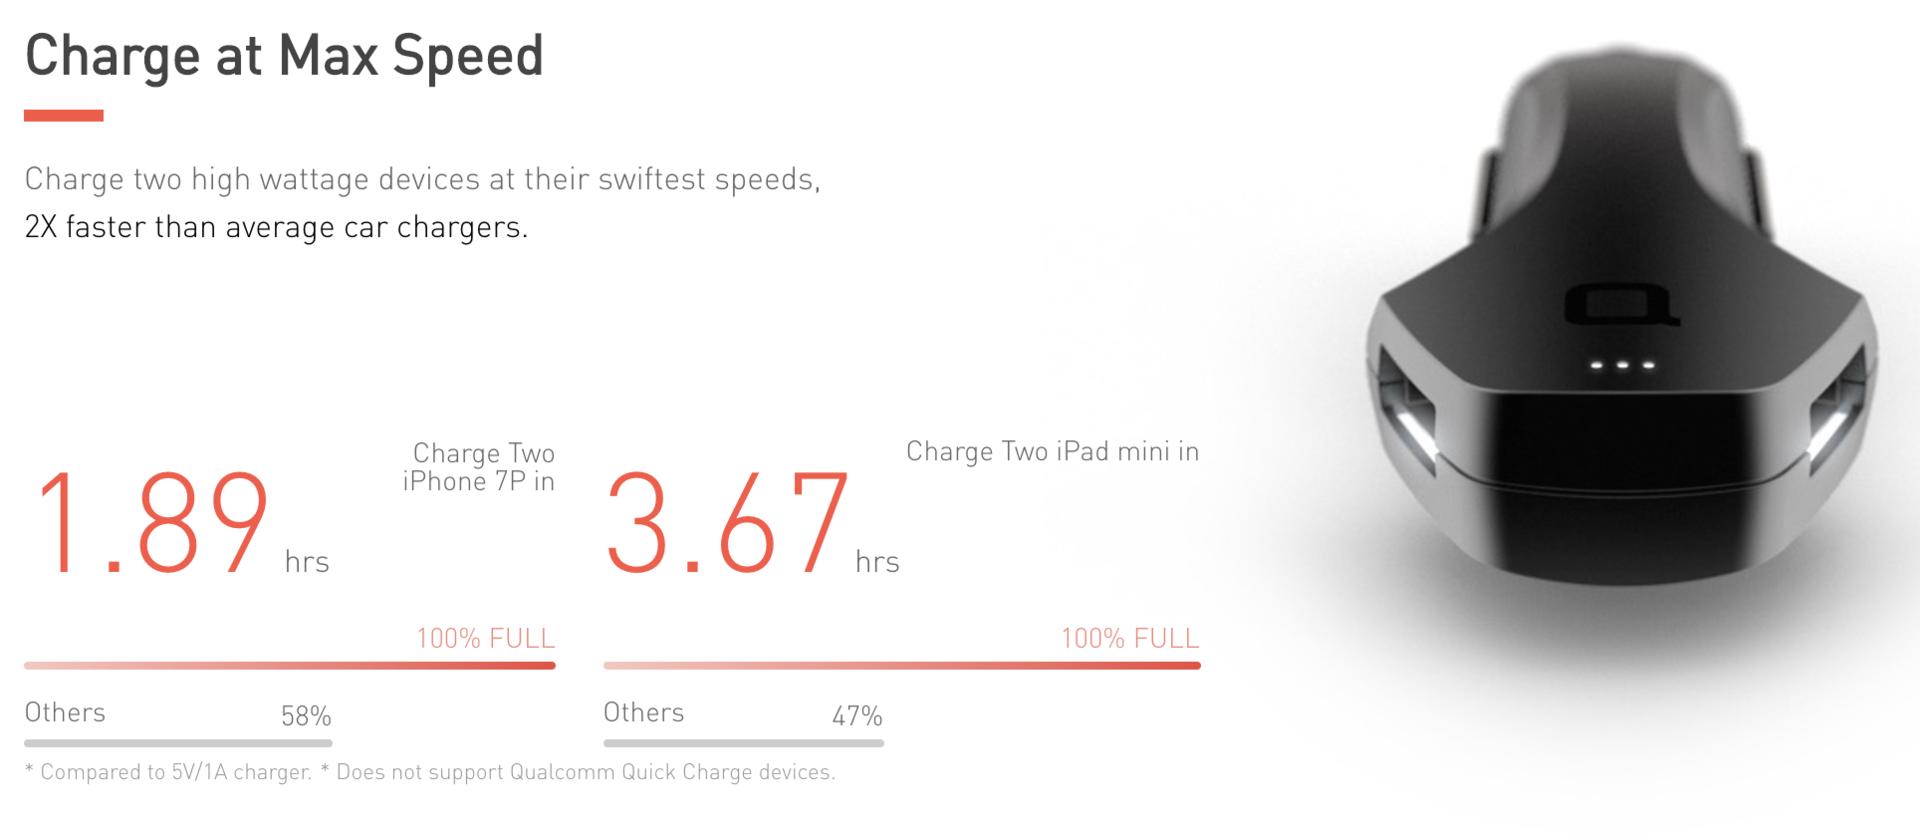 ZUS: 16% за 15 минут. Зарядка в автомобиль с функциями Bluetooth-метки - 17